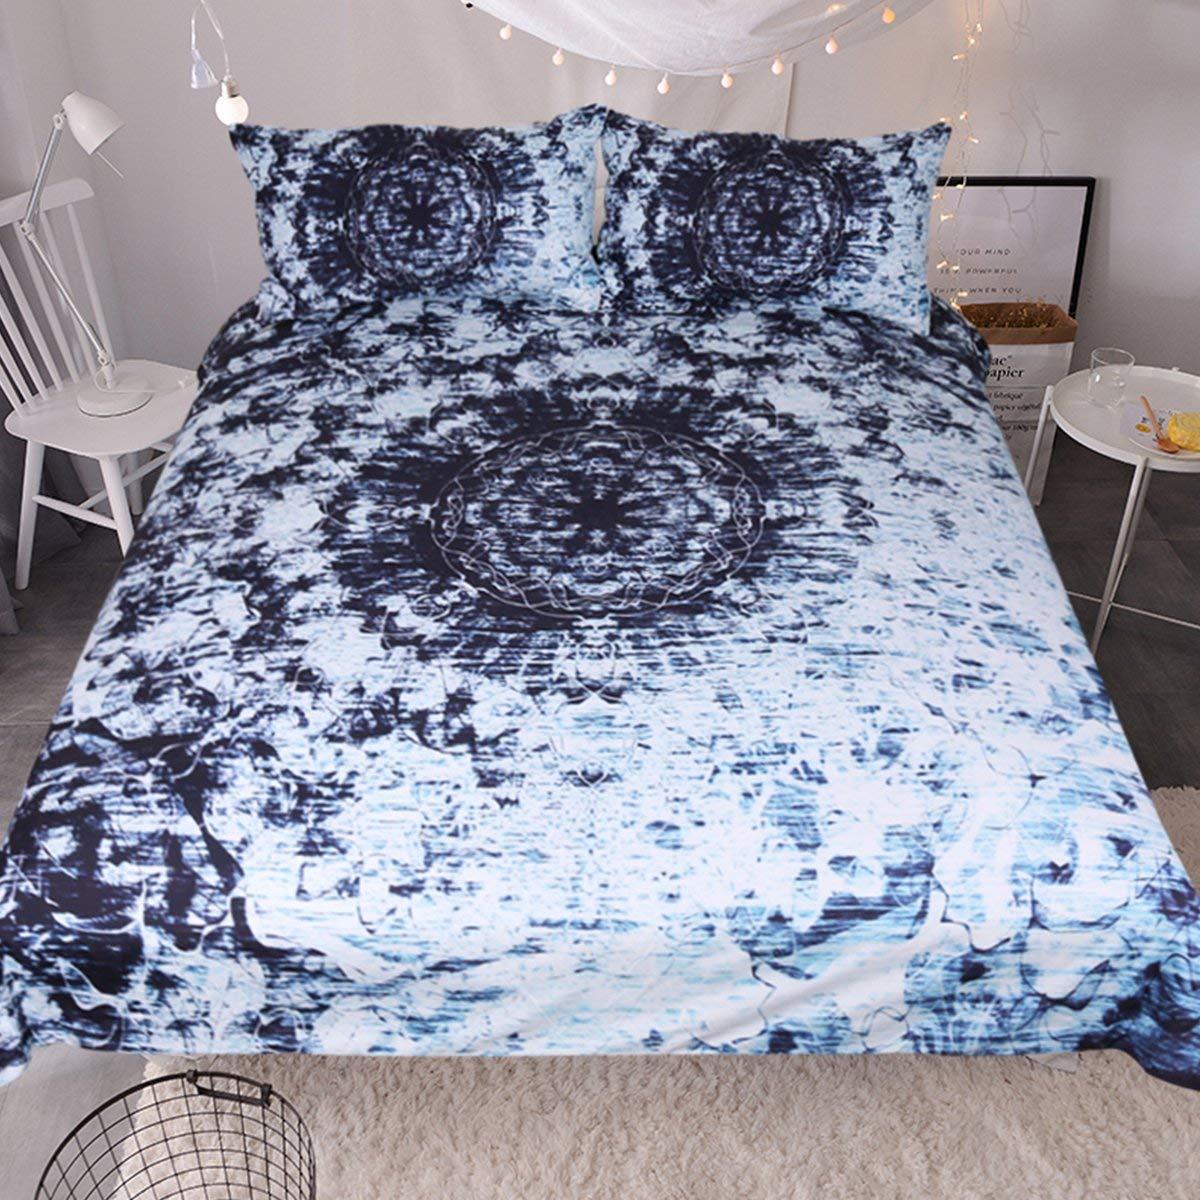 Sleepwish Indigo Blue Tie Dye Ink Bedding Watercolor Mandala Boho Gypsy Bedding Duvet Cover Retro Bed Set (Full)